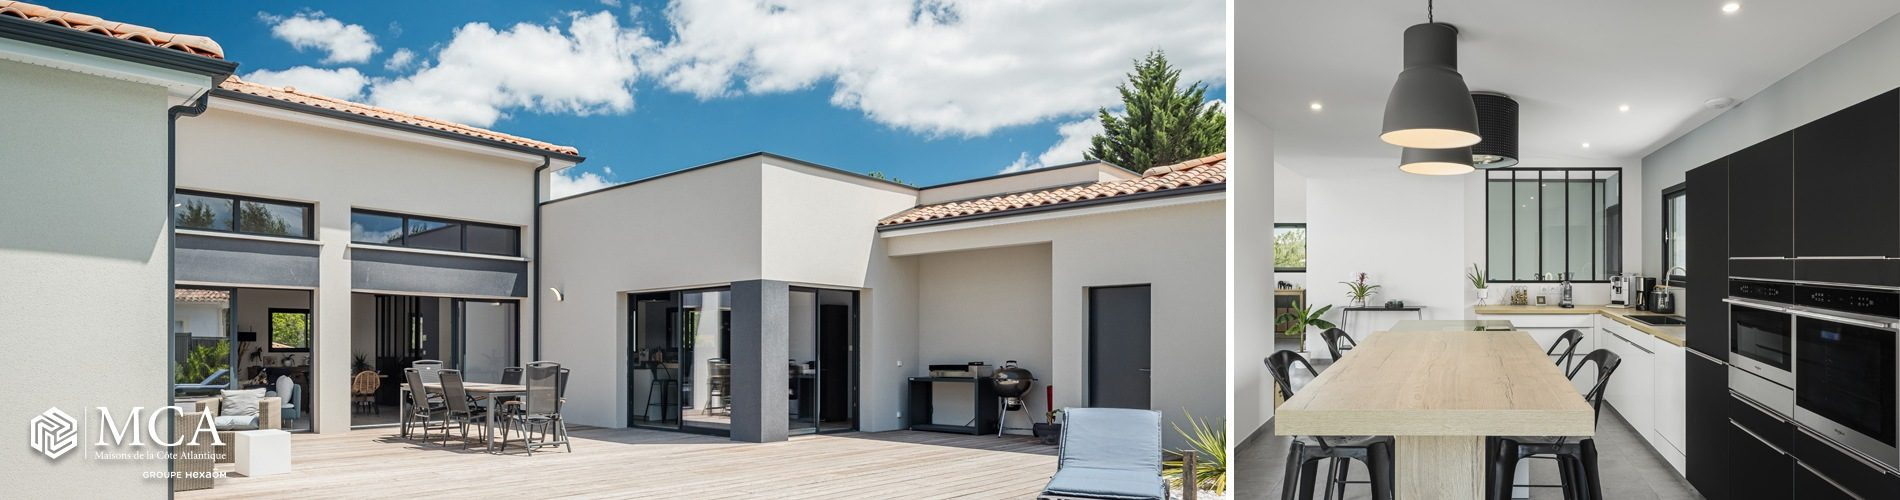 Grande maison contemporaine Gironde